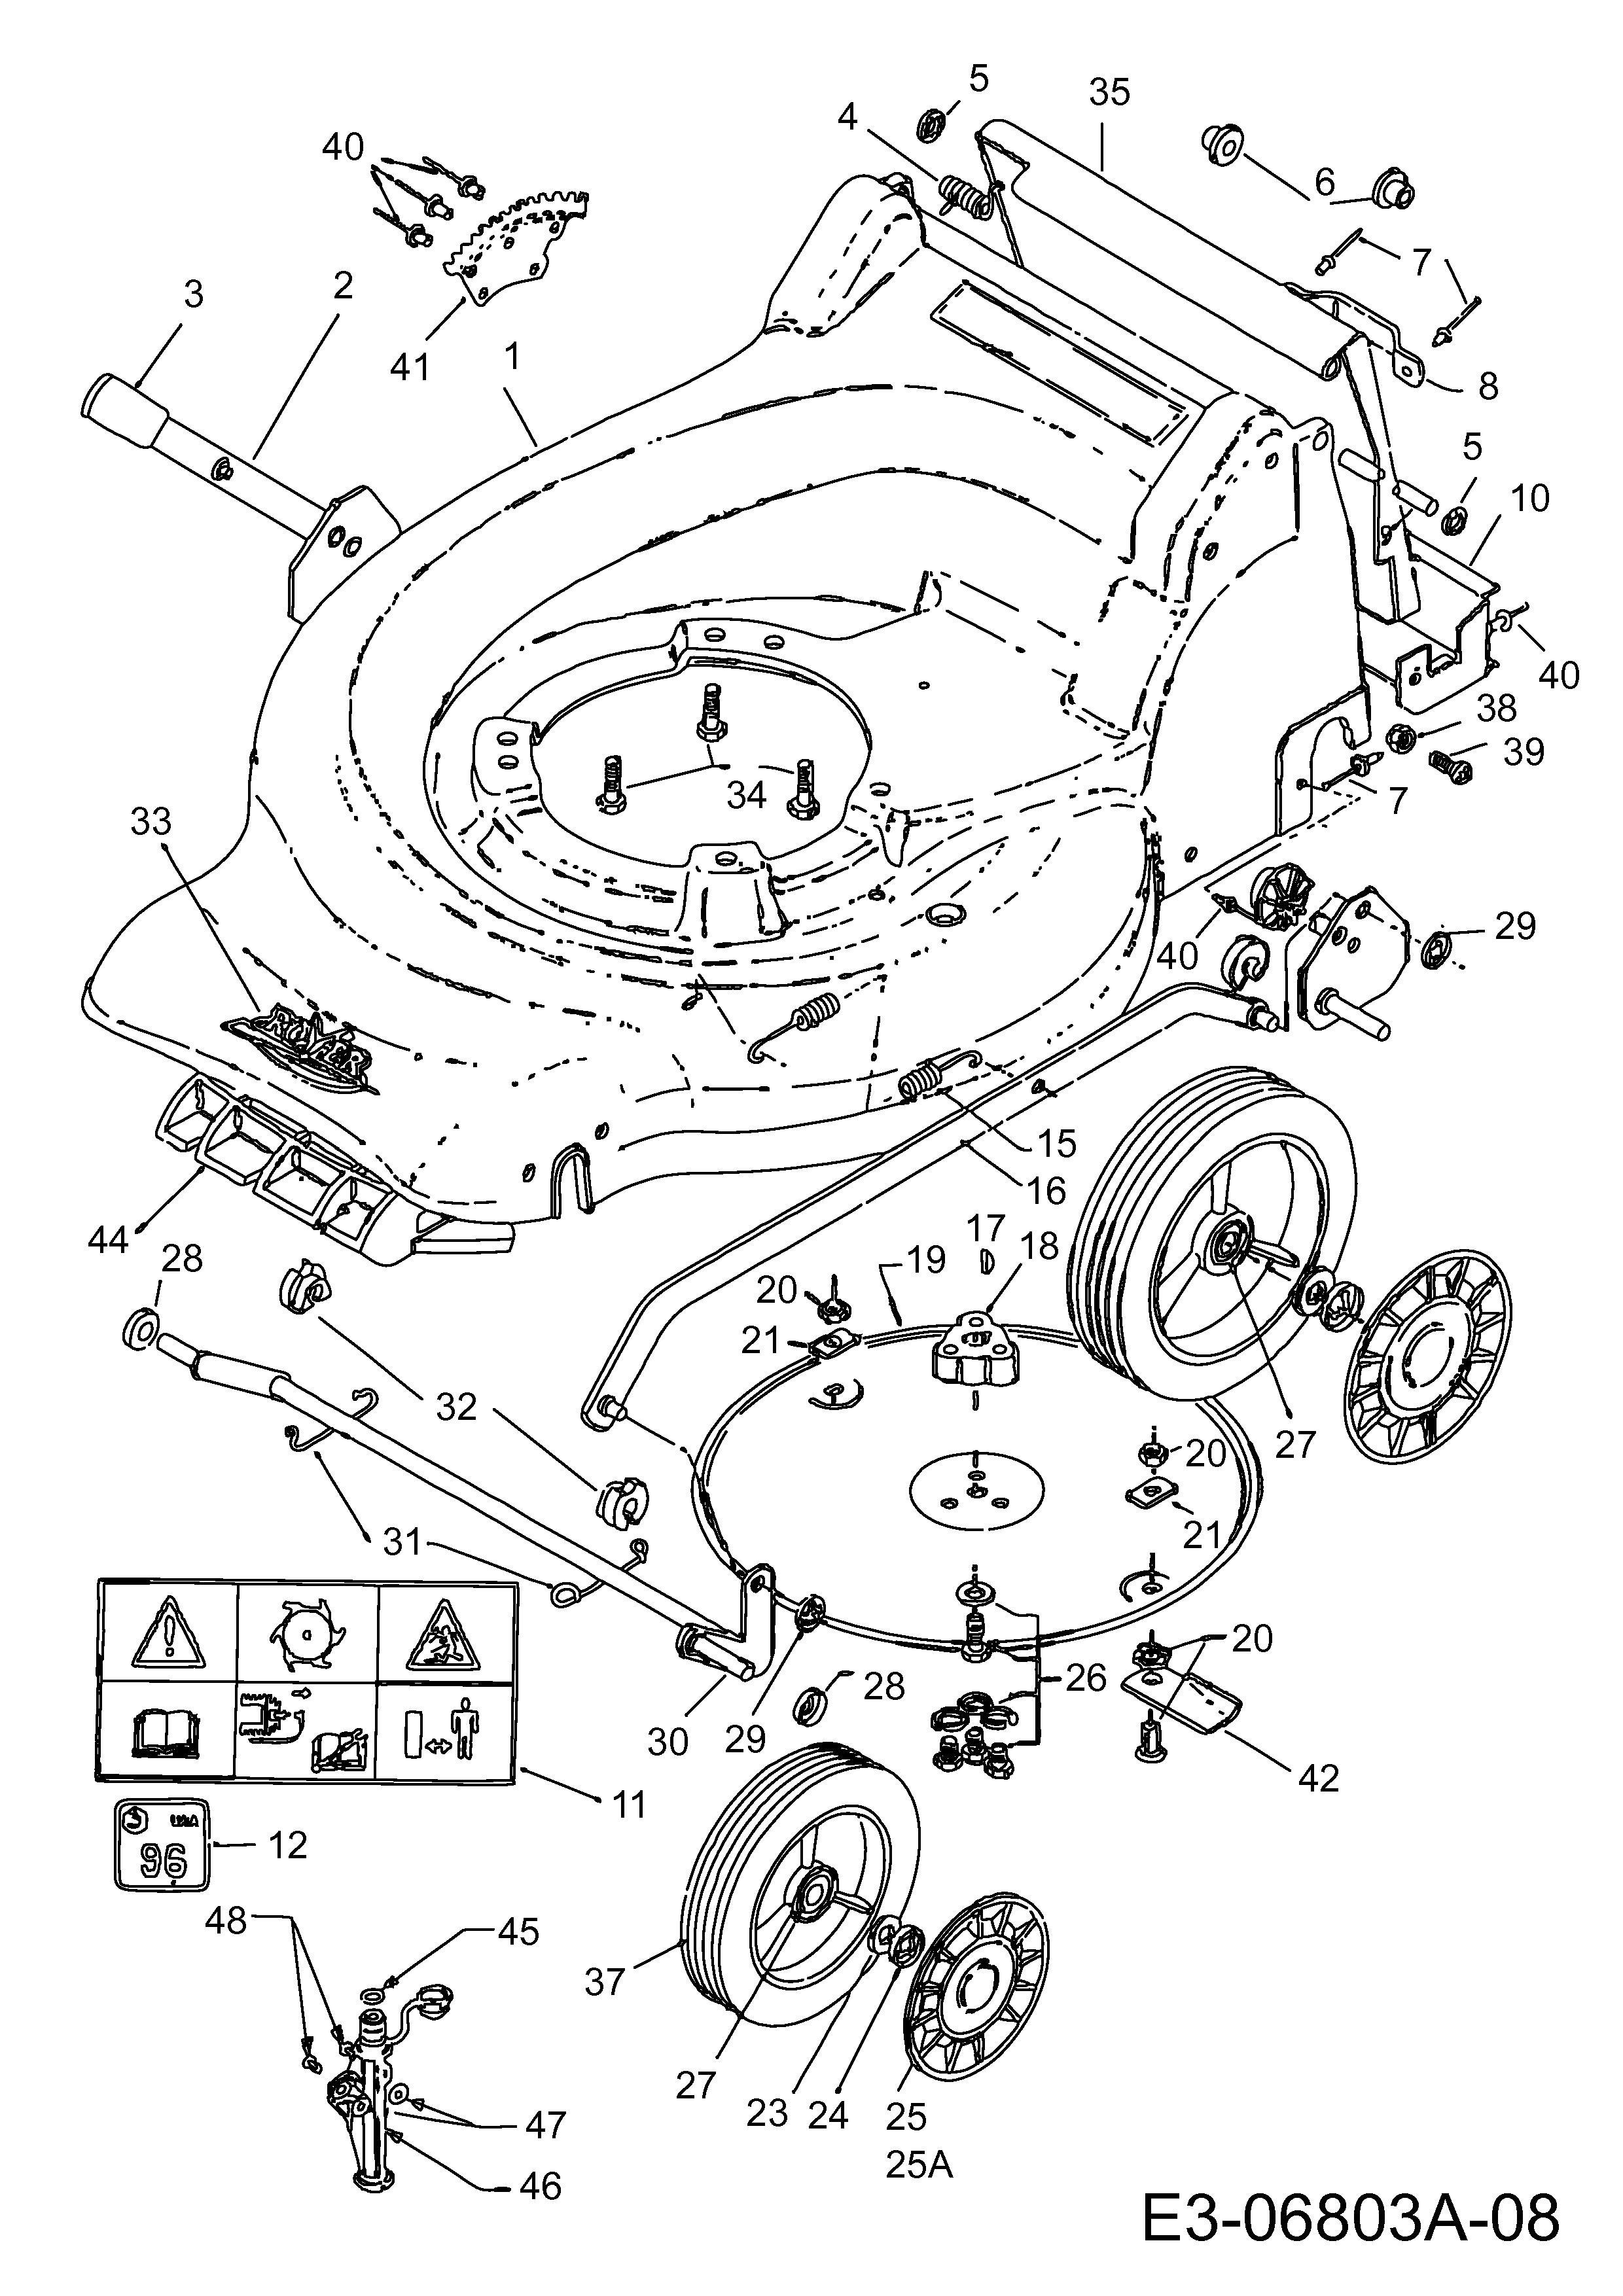 Briggs And Stratton Wiring Diagram